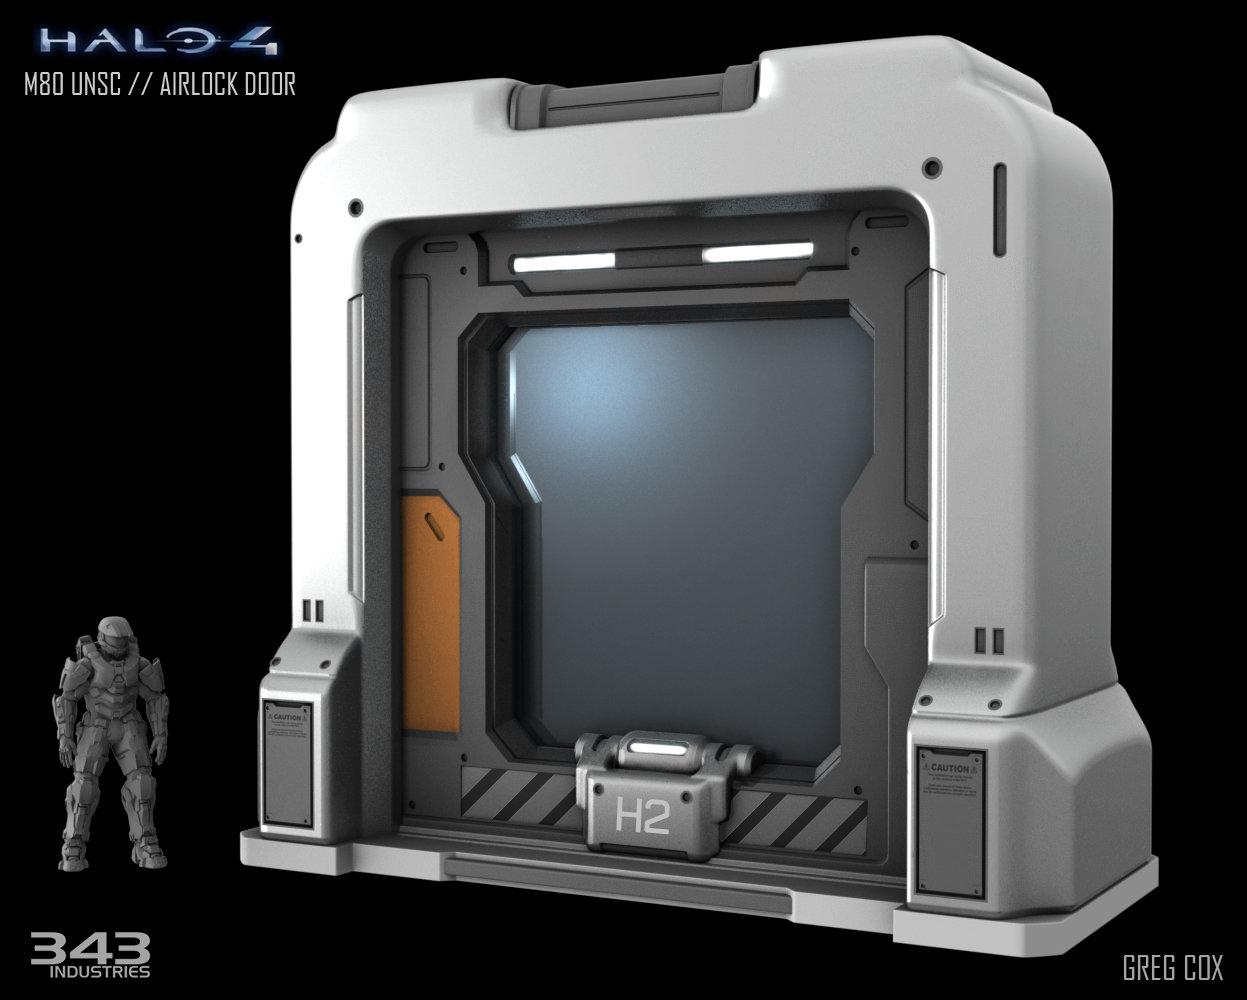 Halo 4 // UNSC Airlock  sc 1 st  ArtStation & ArtStation - Halo 4 // UNSC Airlock Greg Cox pezcame.com